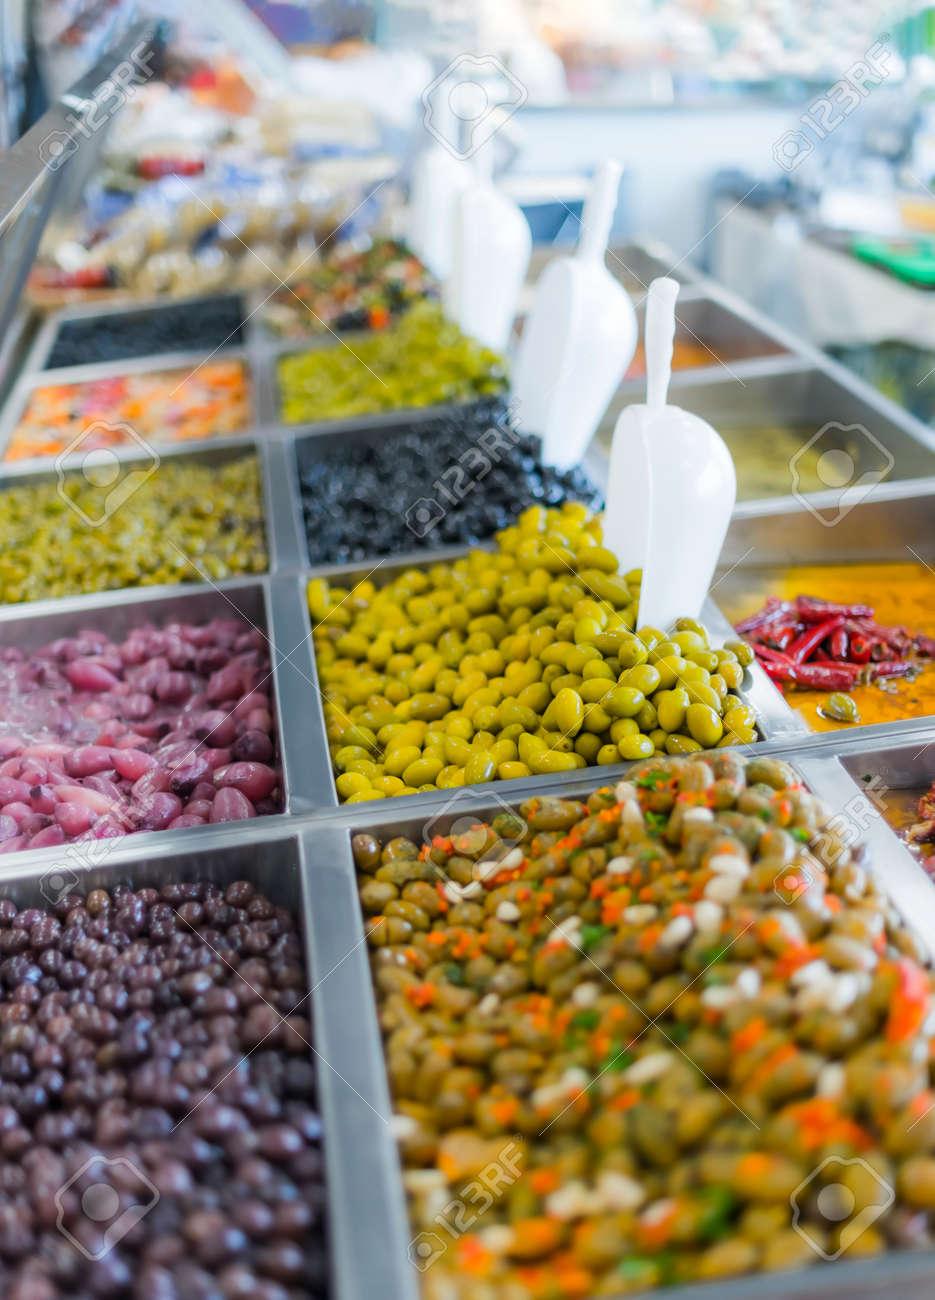 Fresh olives put up for sale in a supermarket. - 168773797